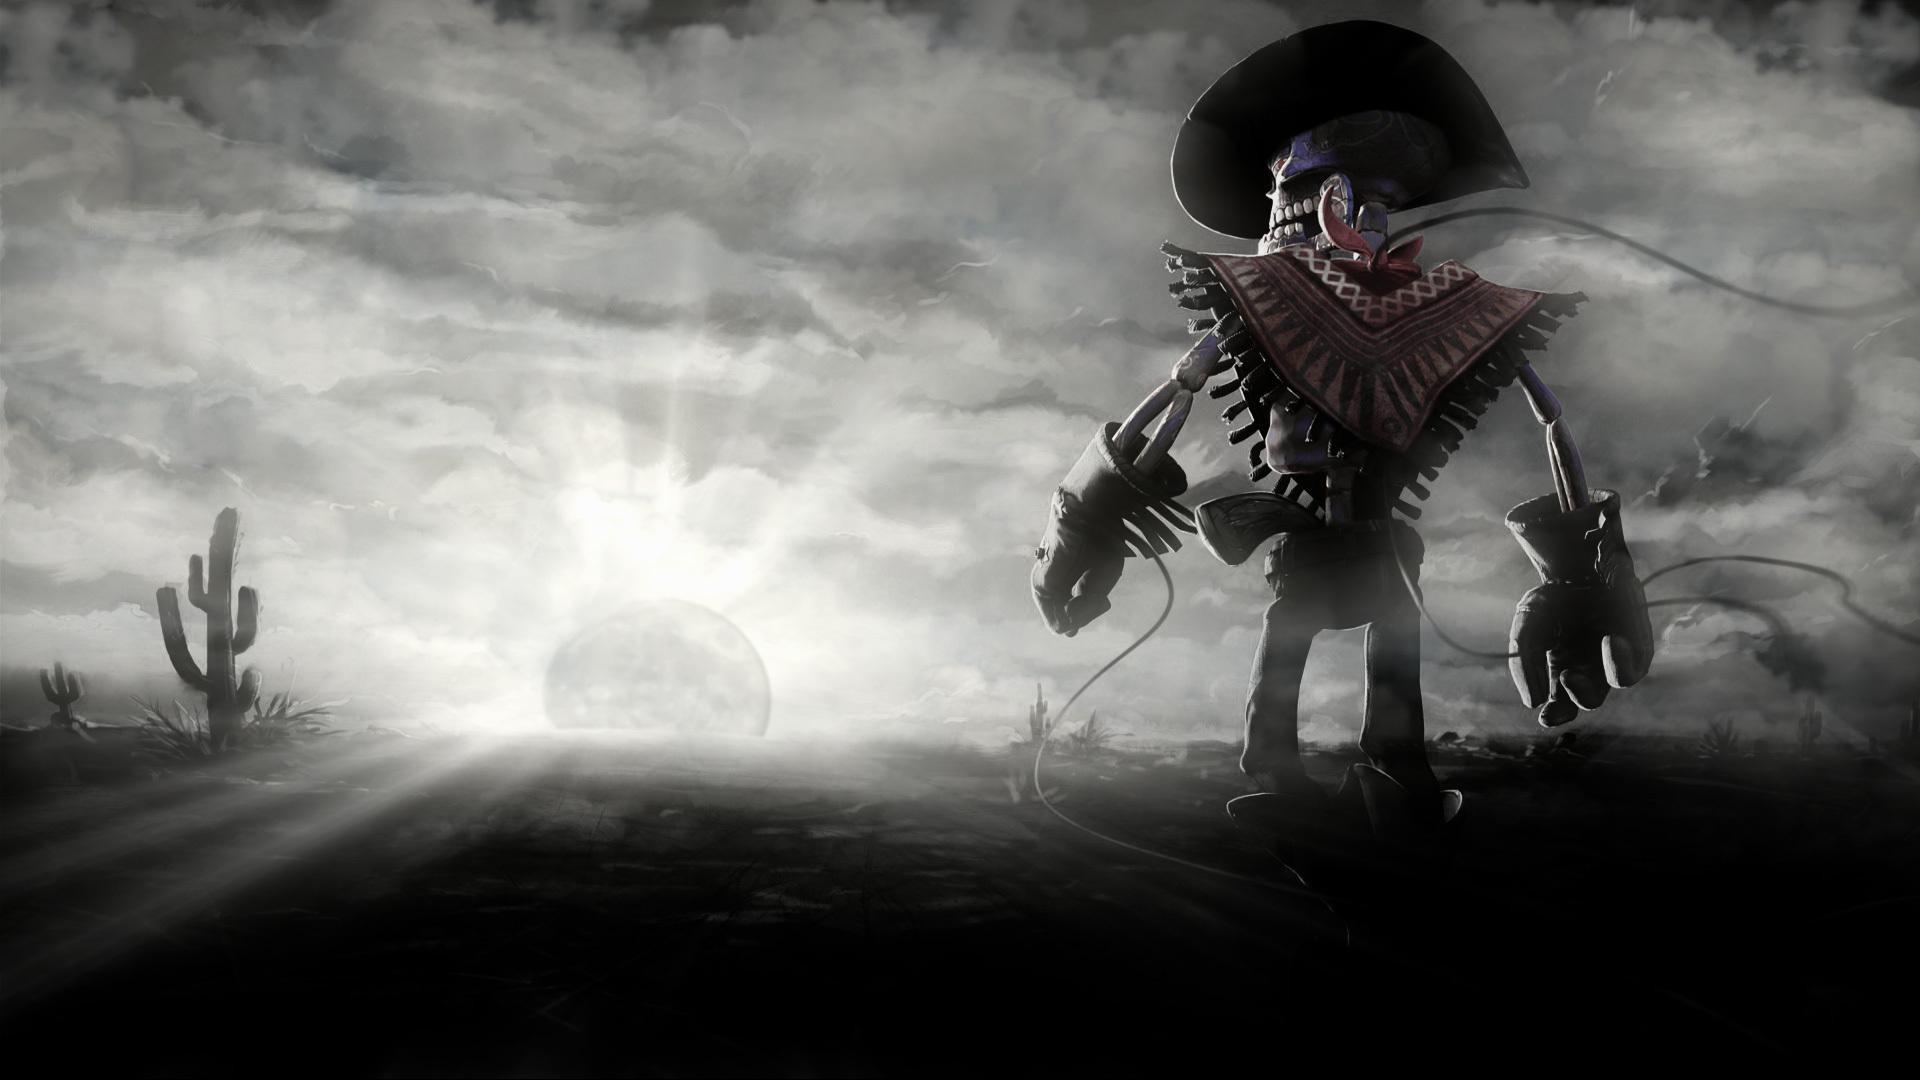 Cowboy-skeleton-sunset-sun-cactus-dark-skull-wallpaper